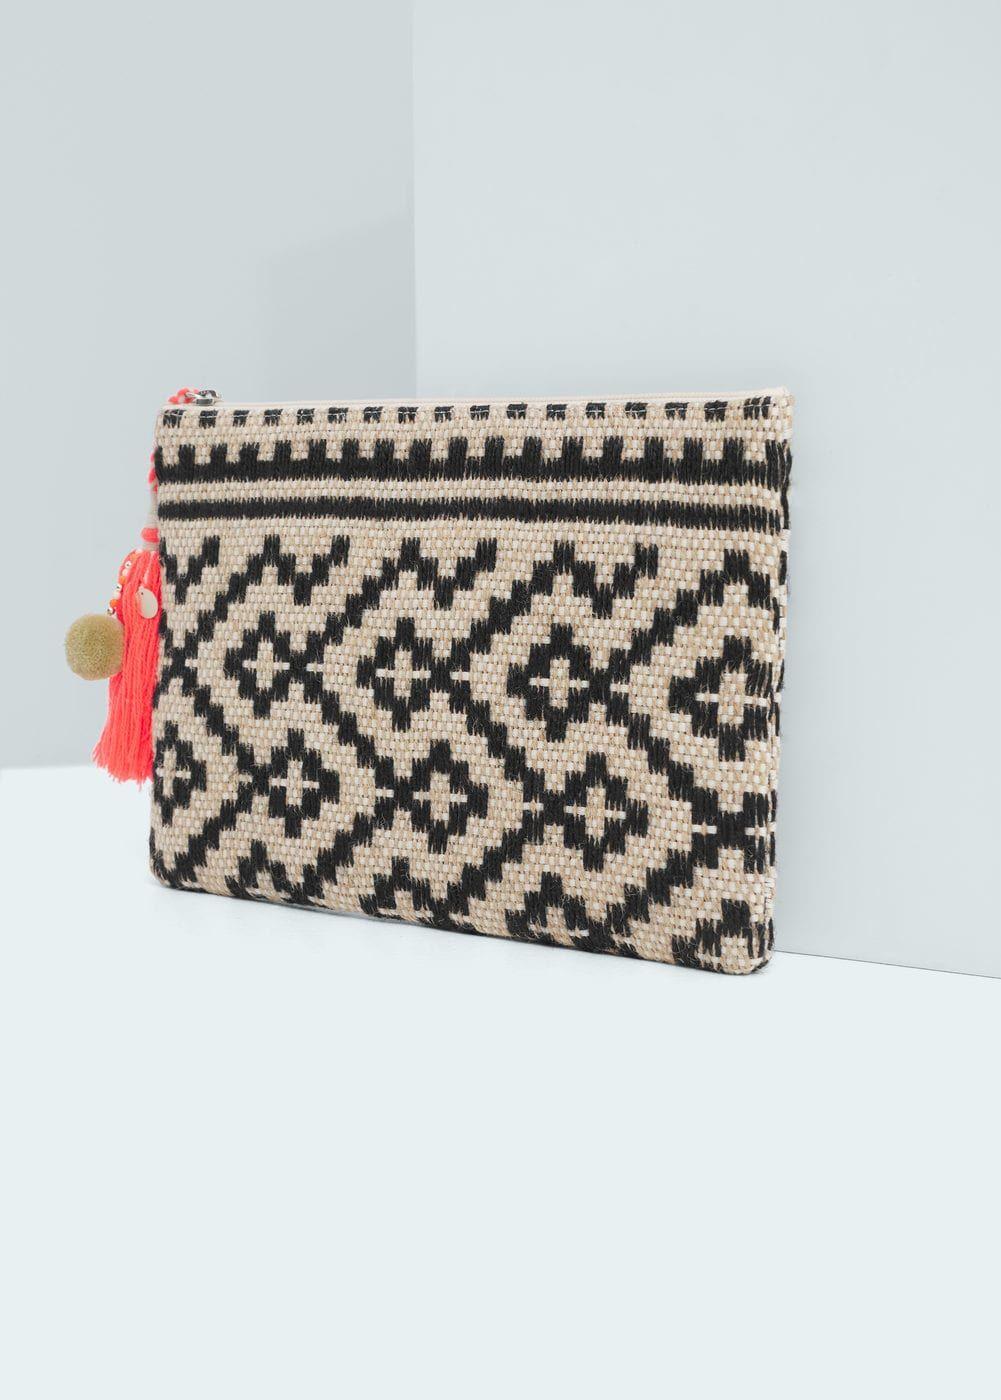 Jute Jacquard Clutch Women Crochet Häkeln Tasche Häkeln Stricken